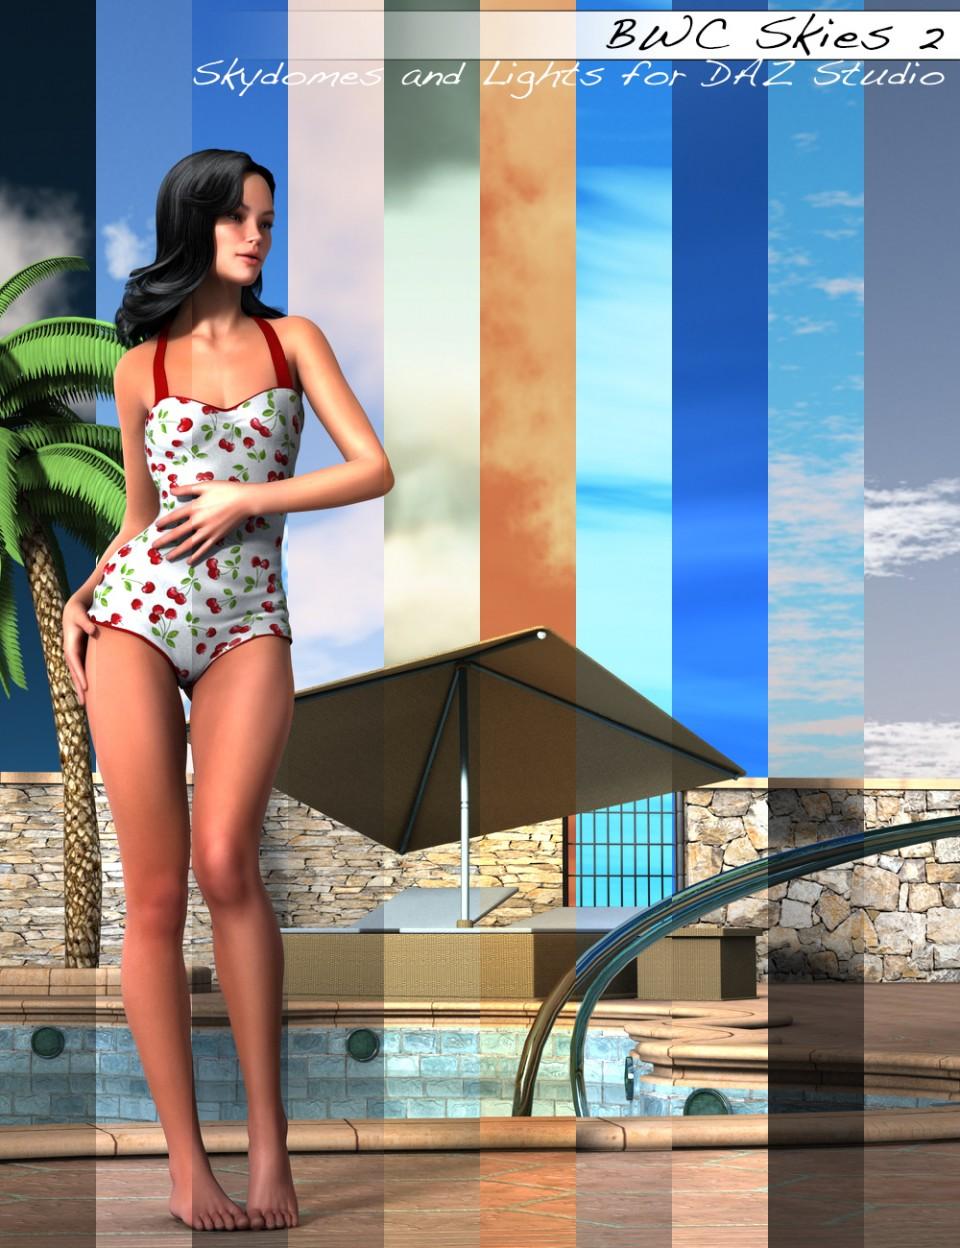 BWC Skies 2 in Vendor, Sedor,  3D Models by Daz 3D